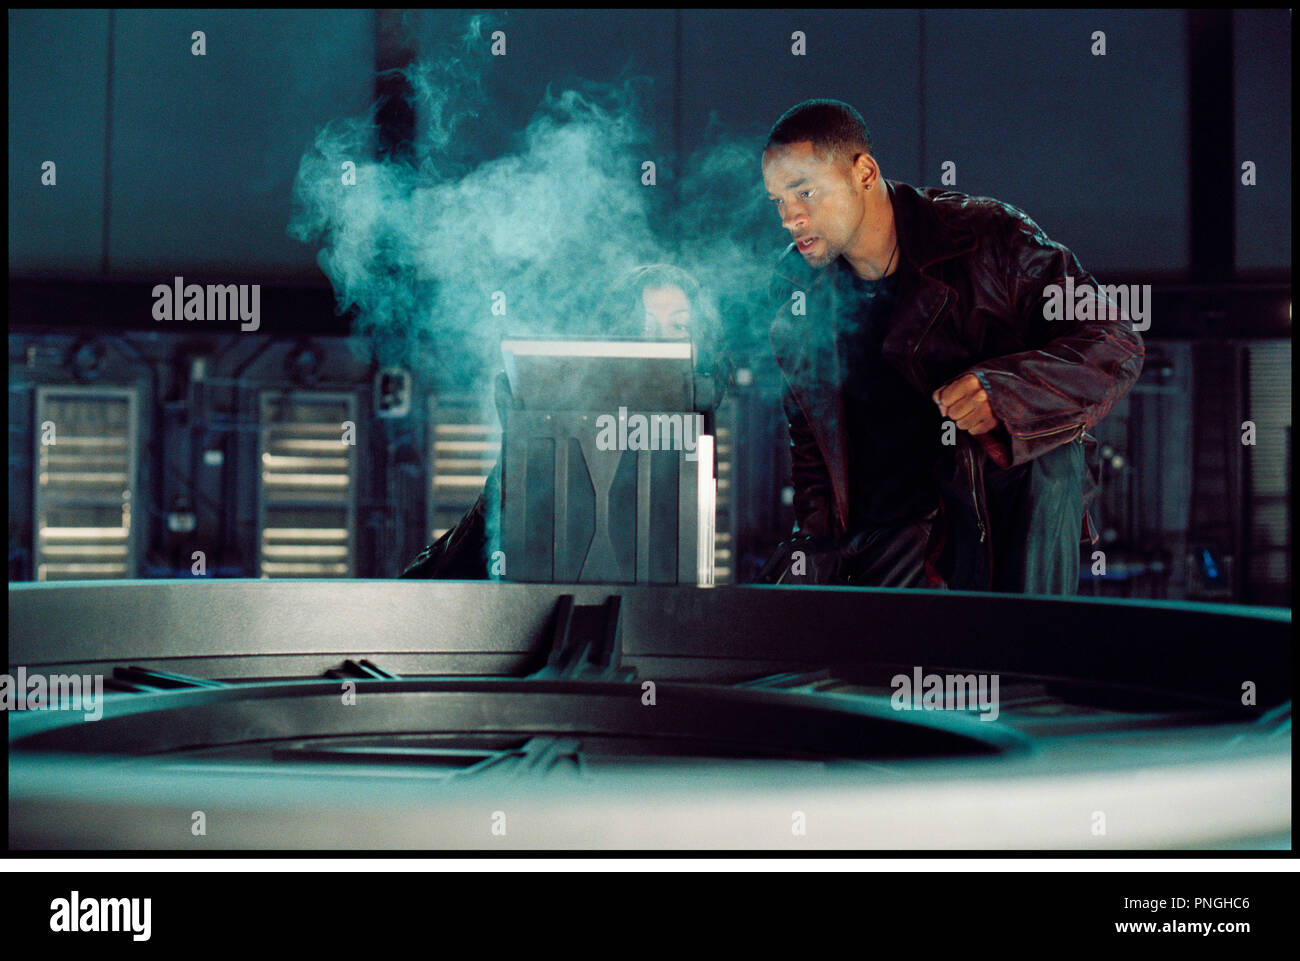 Prod DB © 20th Century Fox - Overbrook Entertainment / DR I, ROBOT (I ROBOT) de Alex Proyas 2004 USA avec Will Smith  inspire du livre de Isaac Asimov  veste en cuir, futuriste, science fiction, fumee - Stock Image